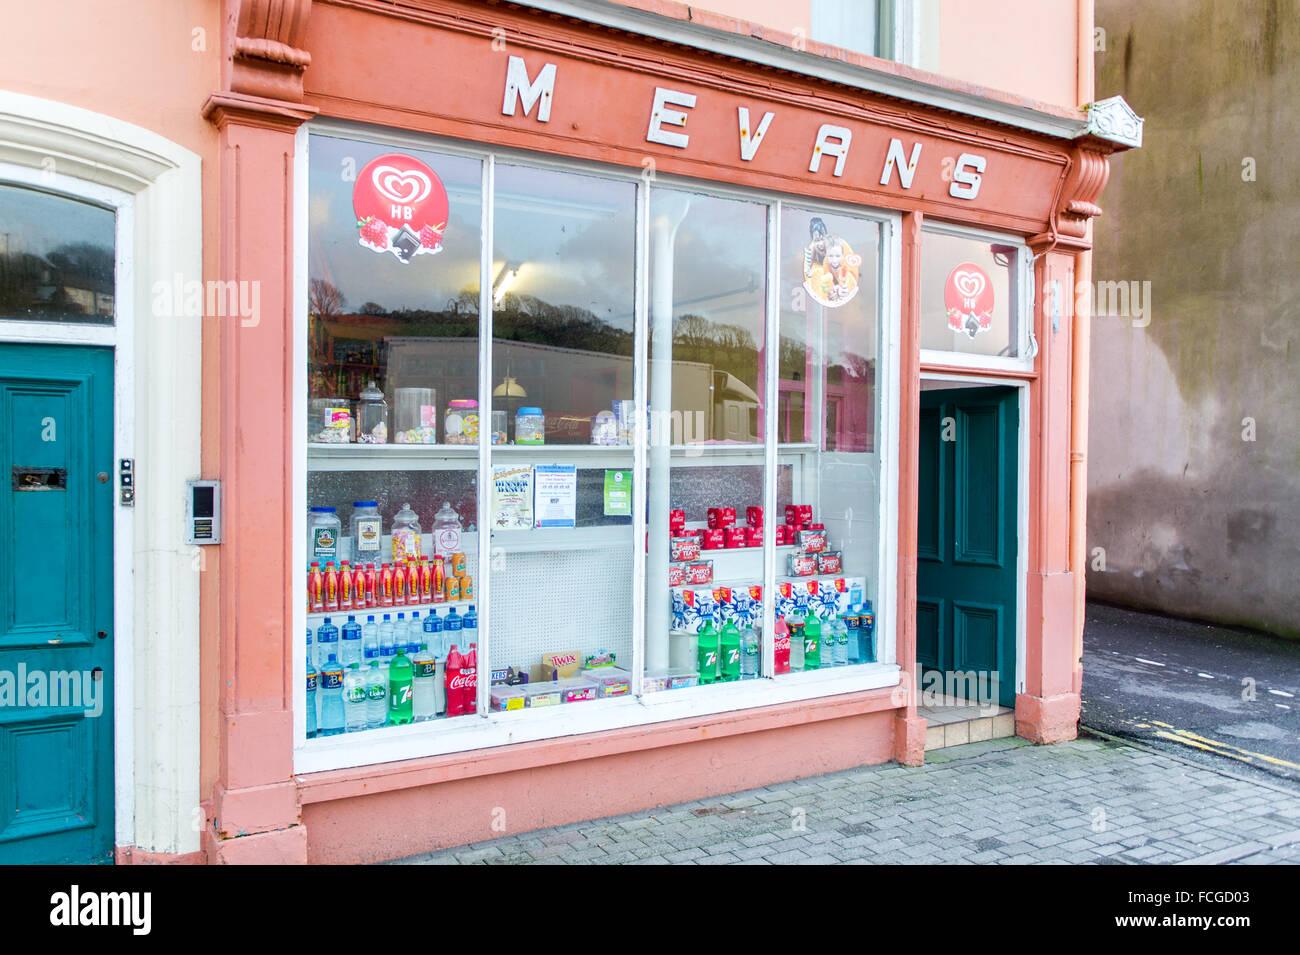 a-local-corner-shop-in-bantry-west-cork-